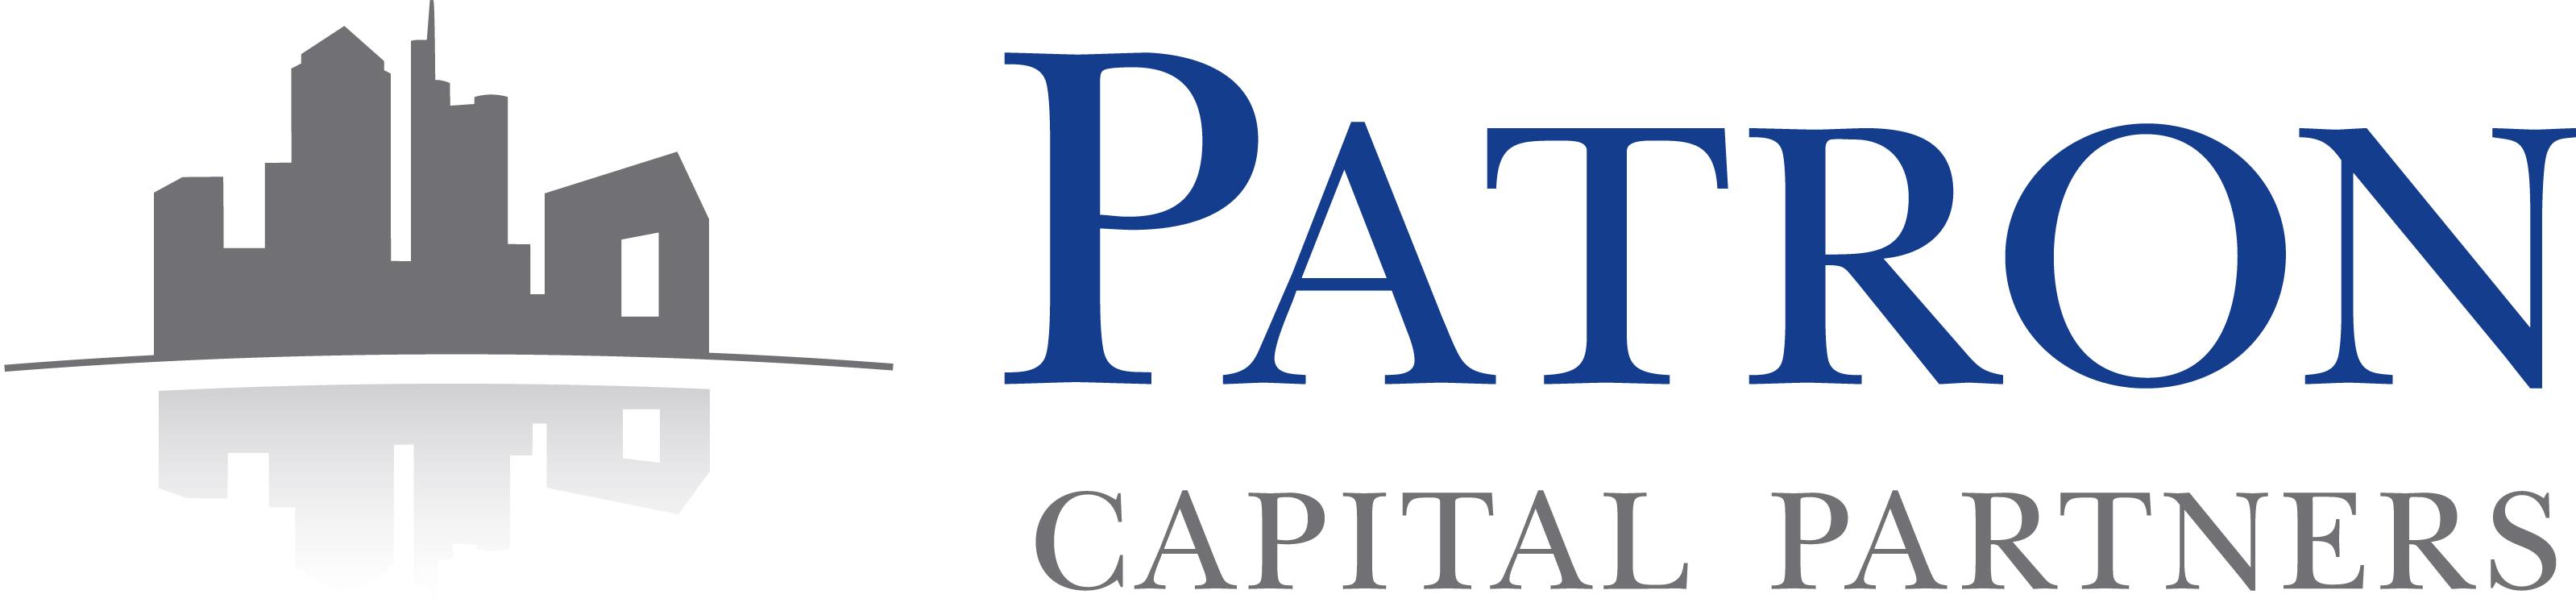 PATRON